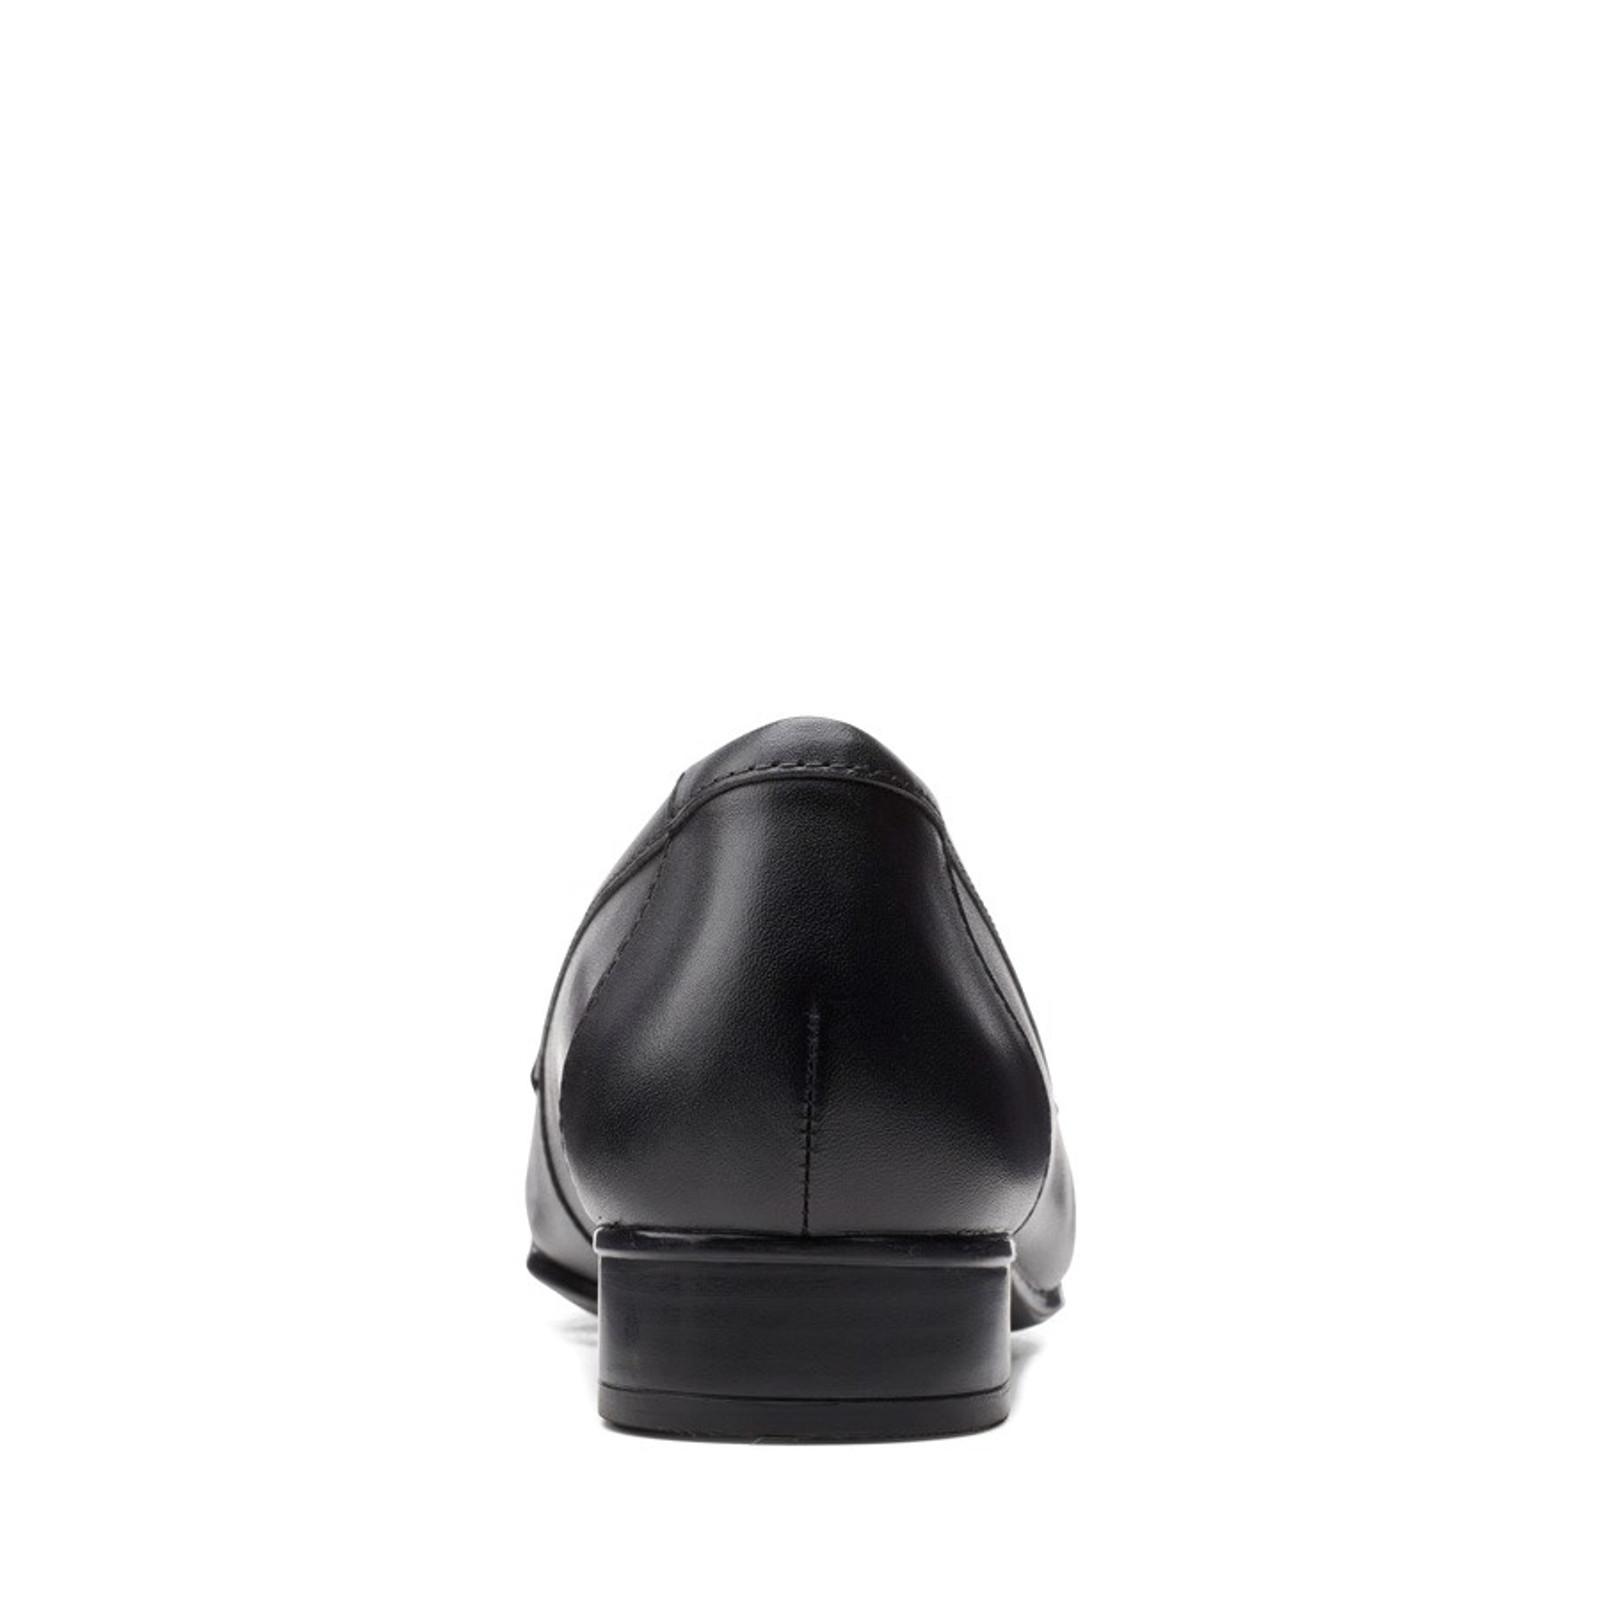 Clarks Womens JULIET COAST Black Leather